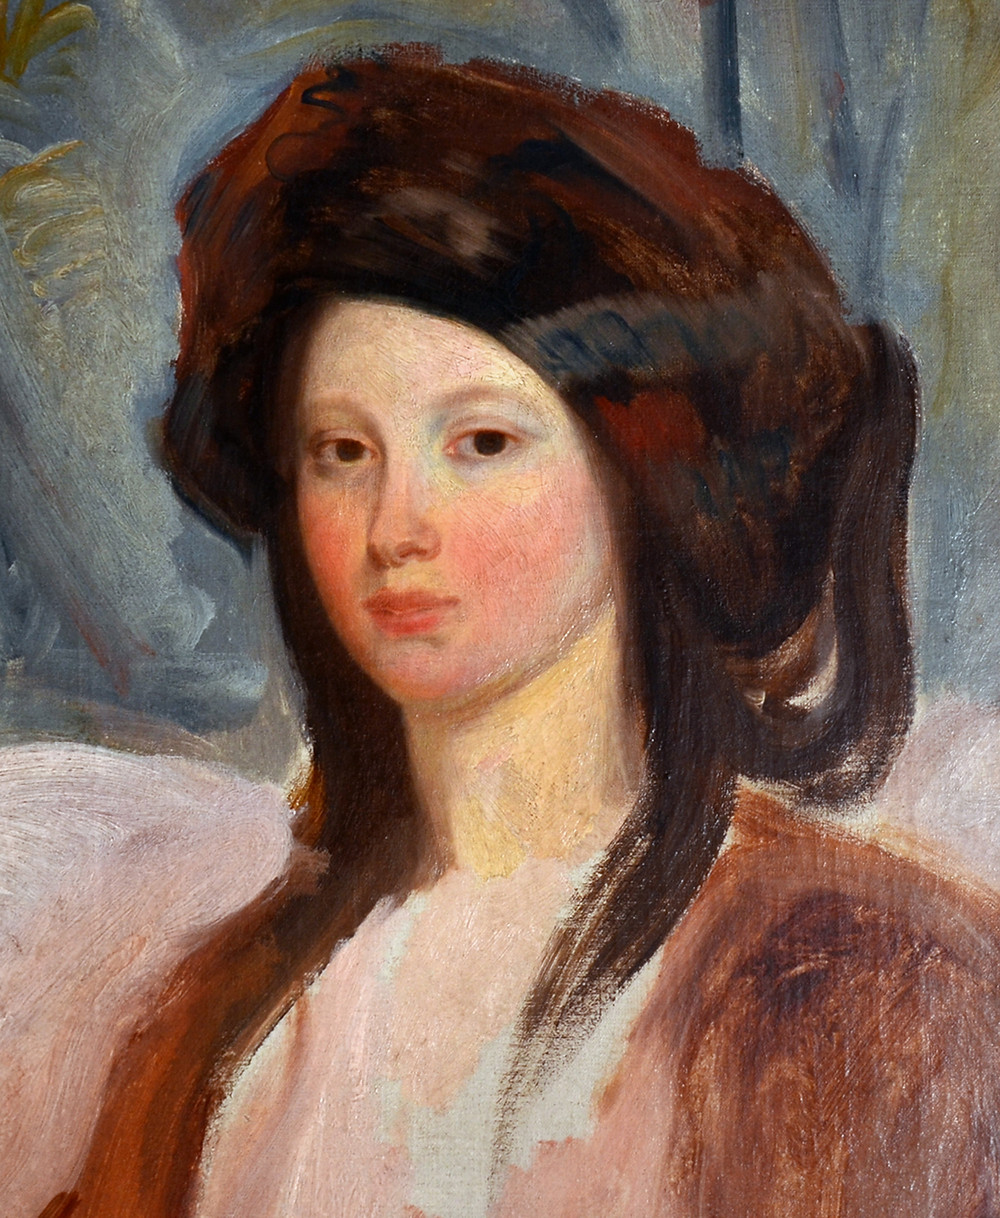 Charles-Emile-Callande de Champmartin, Portrait of Juliette Drouet, 1827 -- in the Victor Hugo Museum